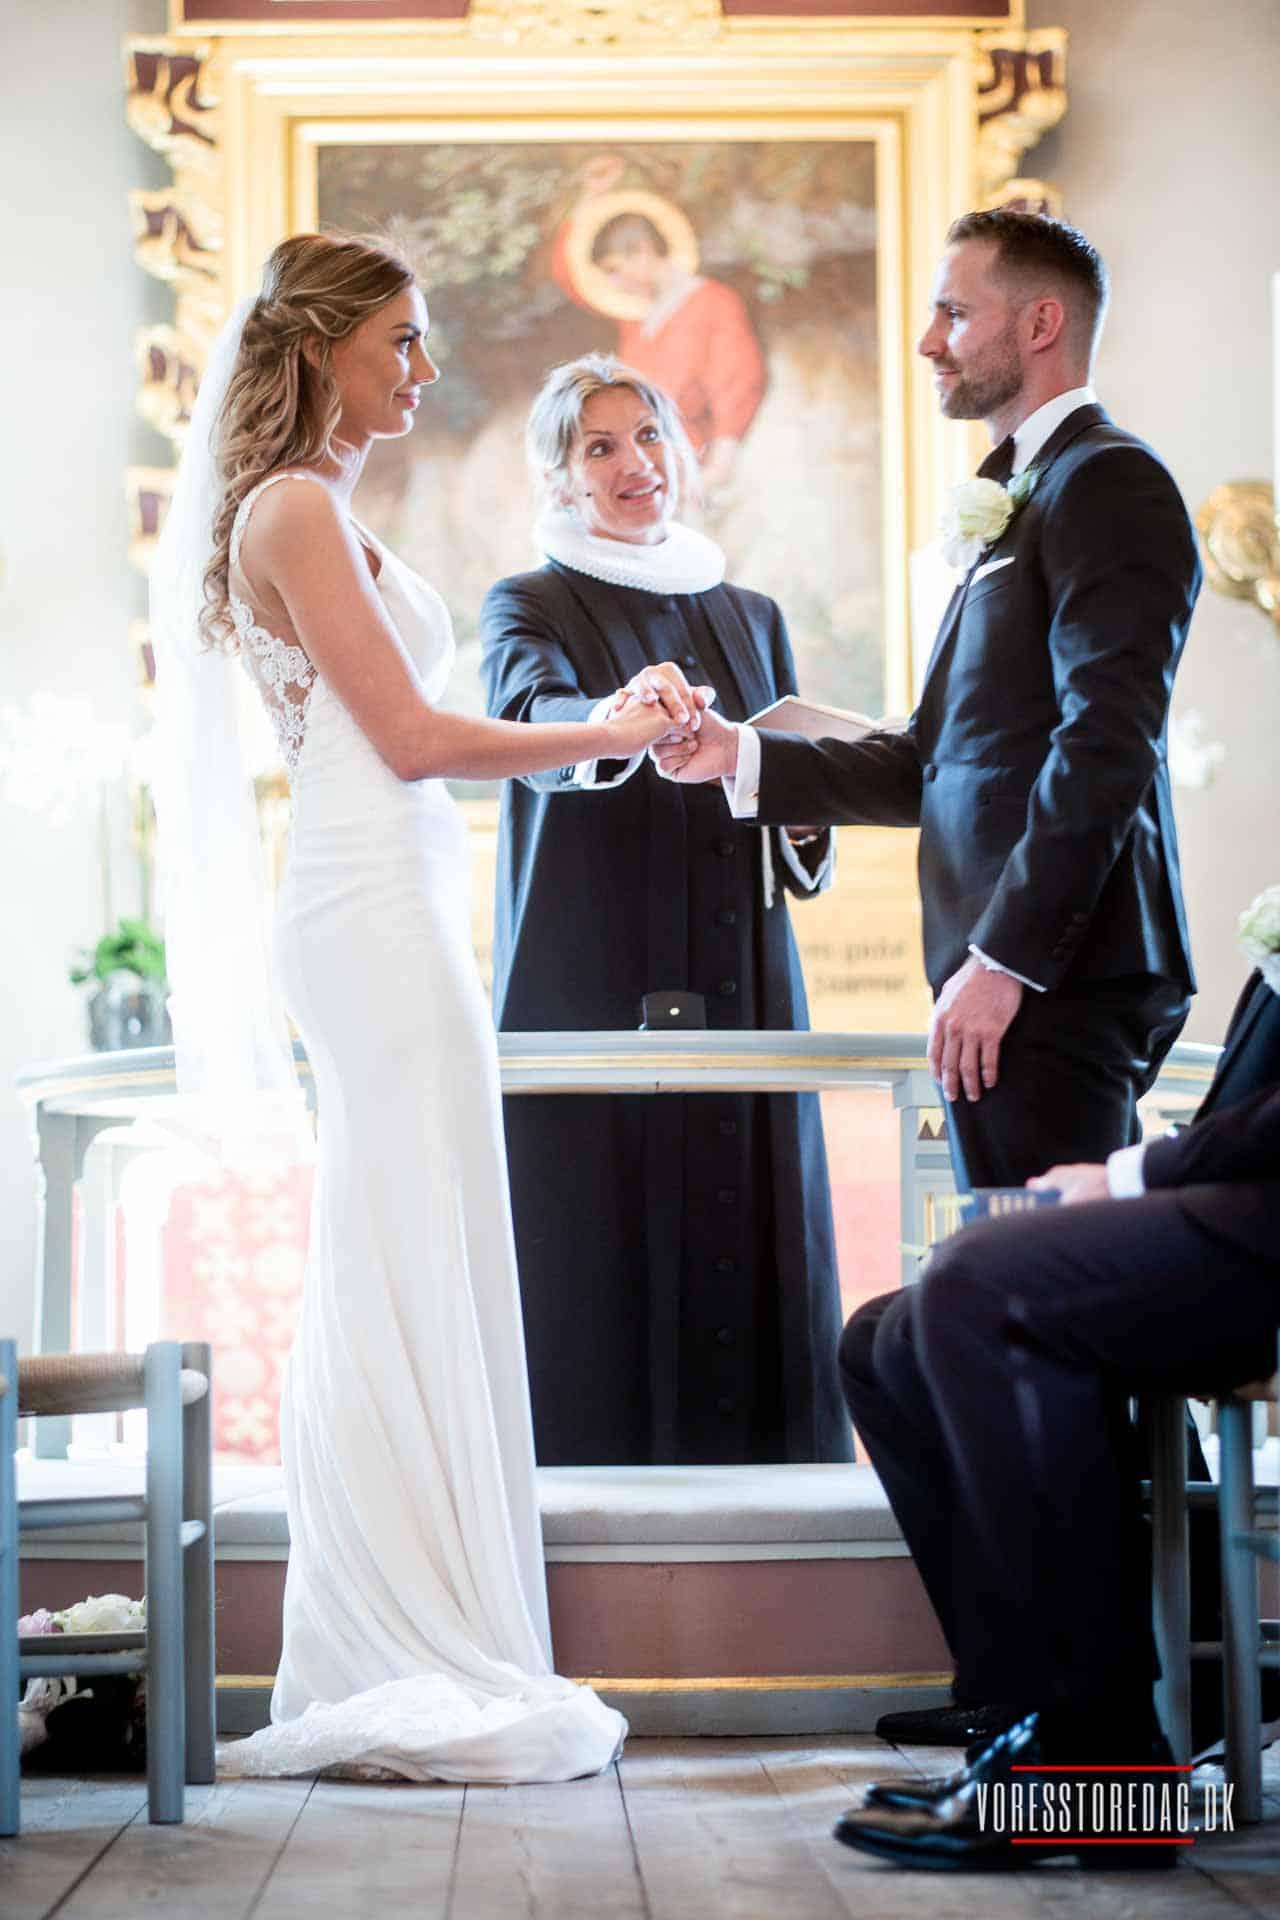 Sådan bliver jeres bryllupsfotografering perfekt